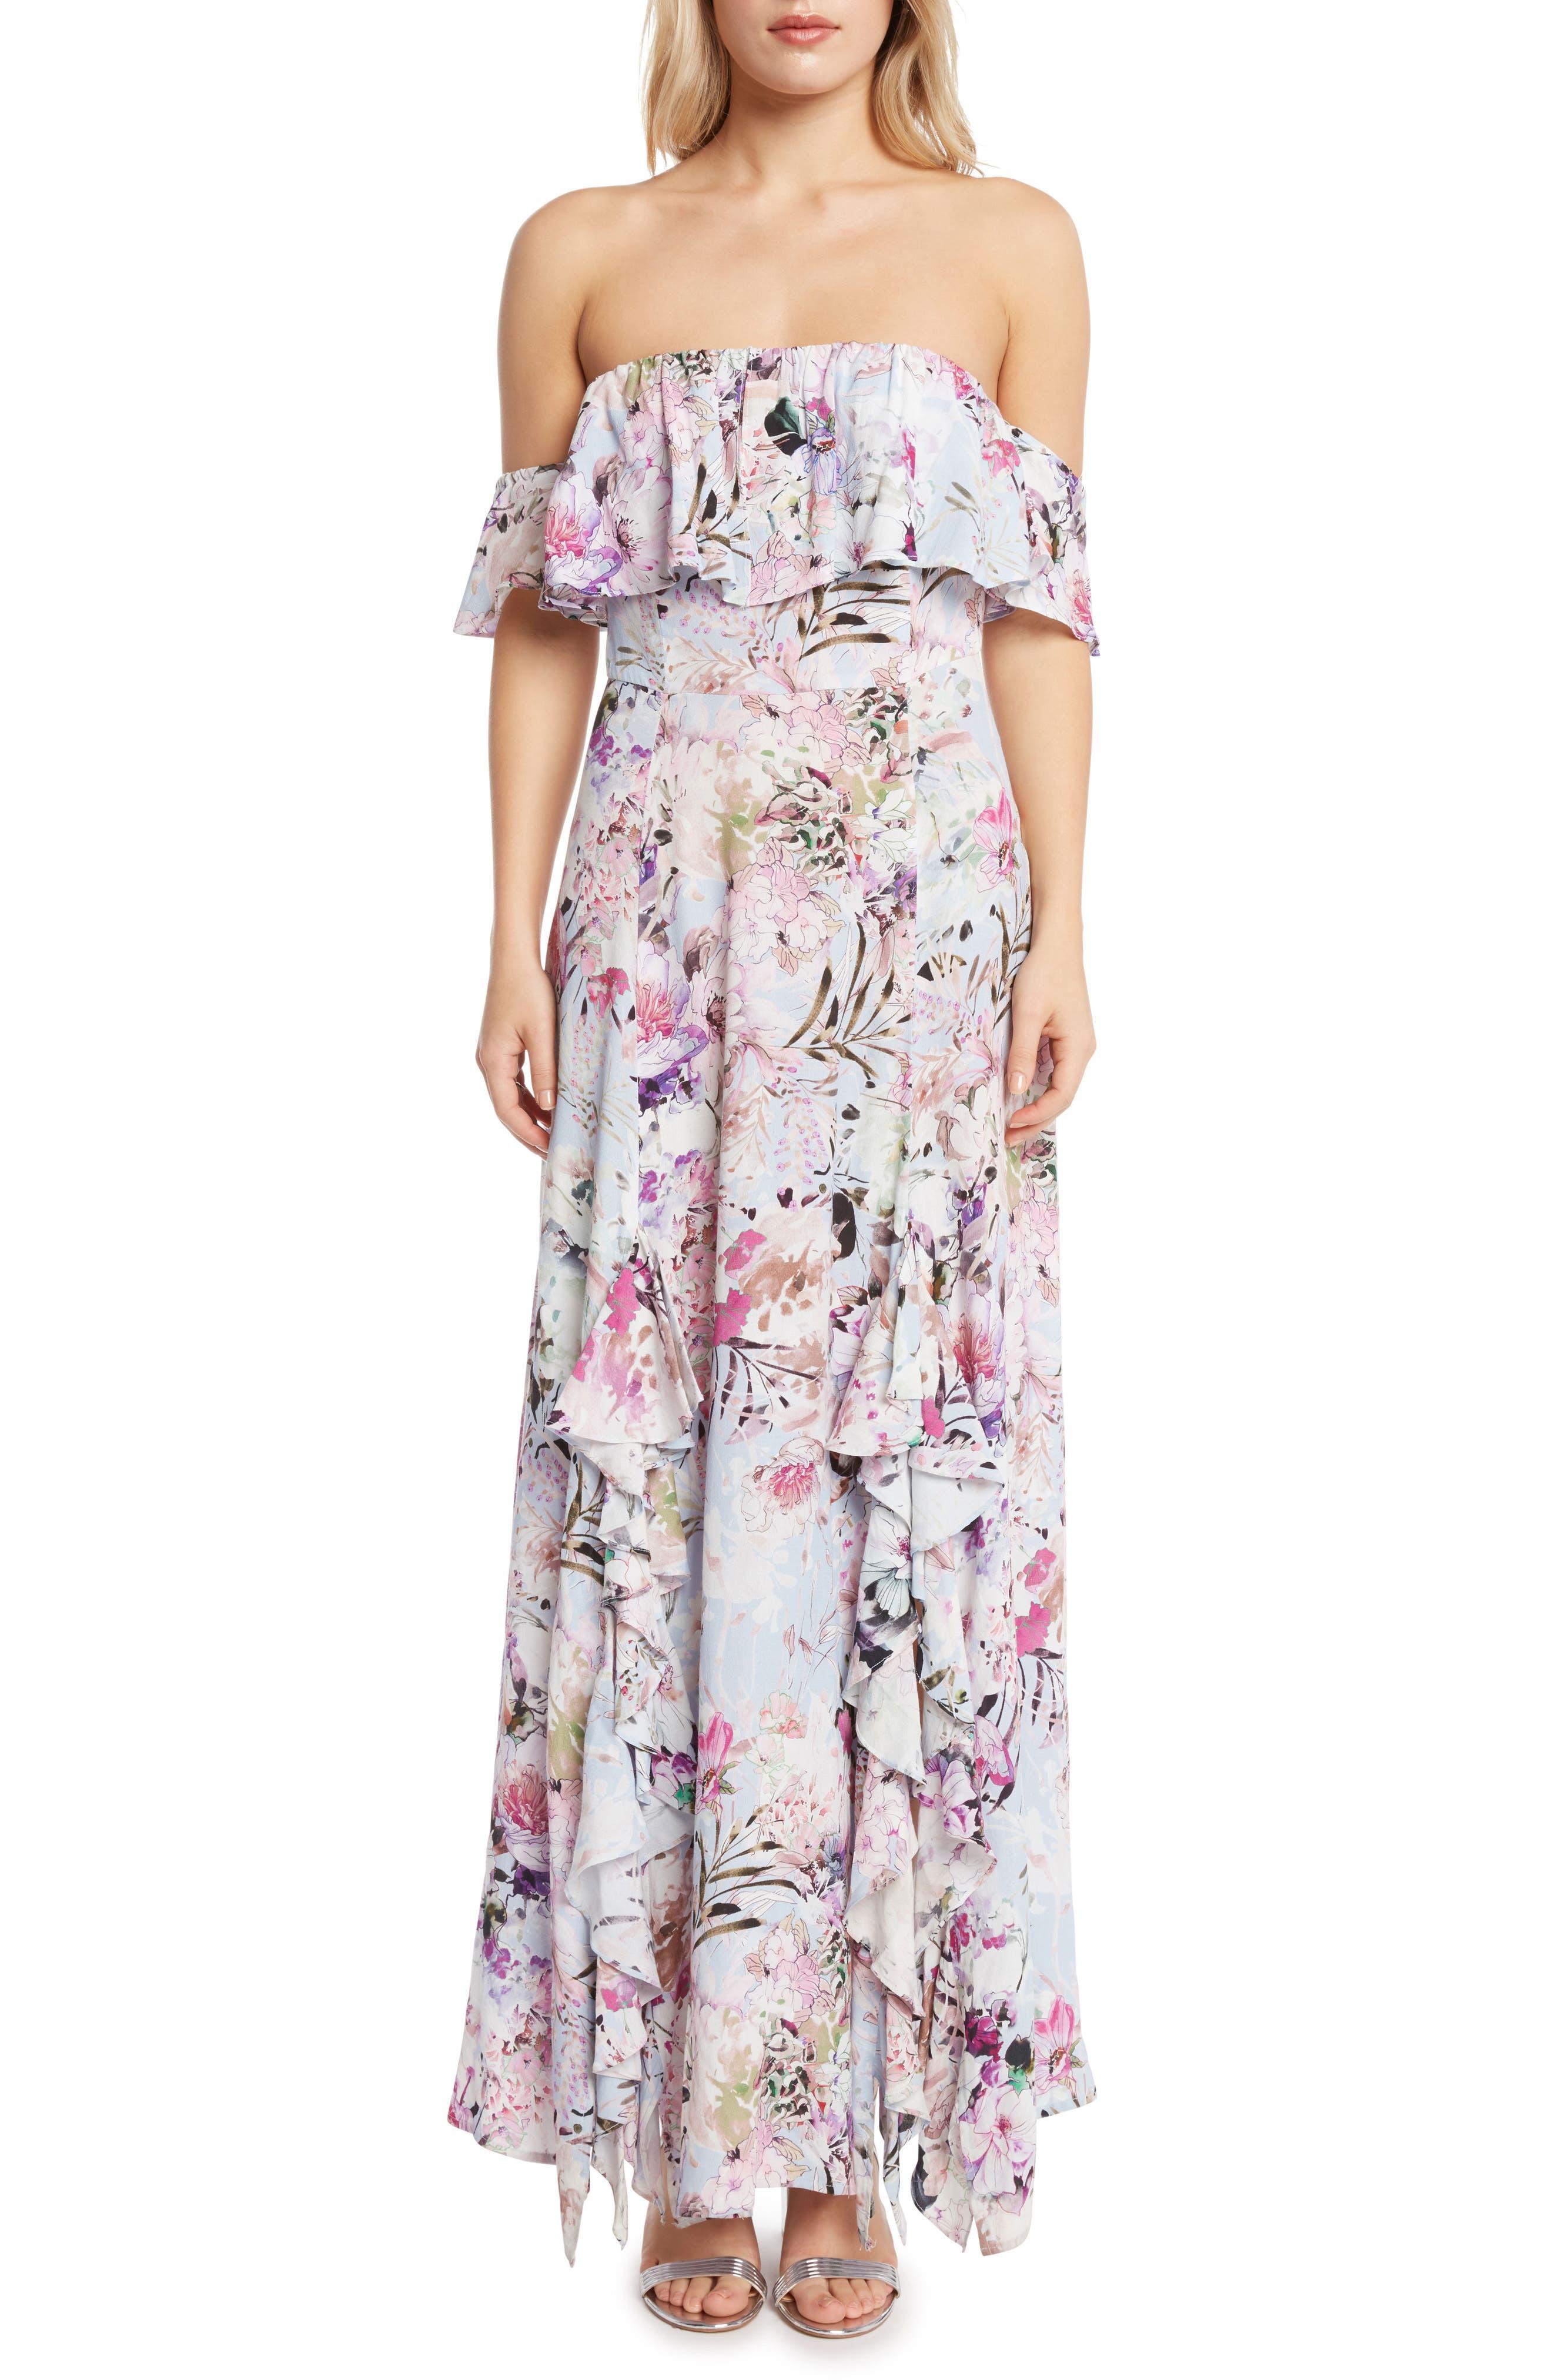 Floral Print Ruffle Maxi Dress,                             Main thumbnail 1, color,                             530